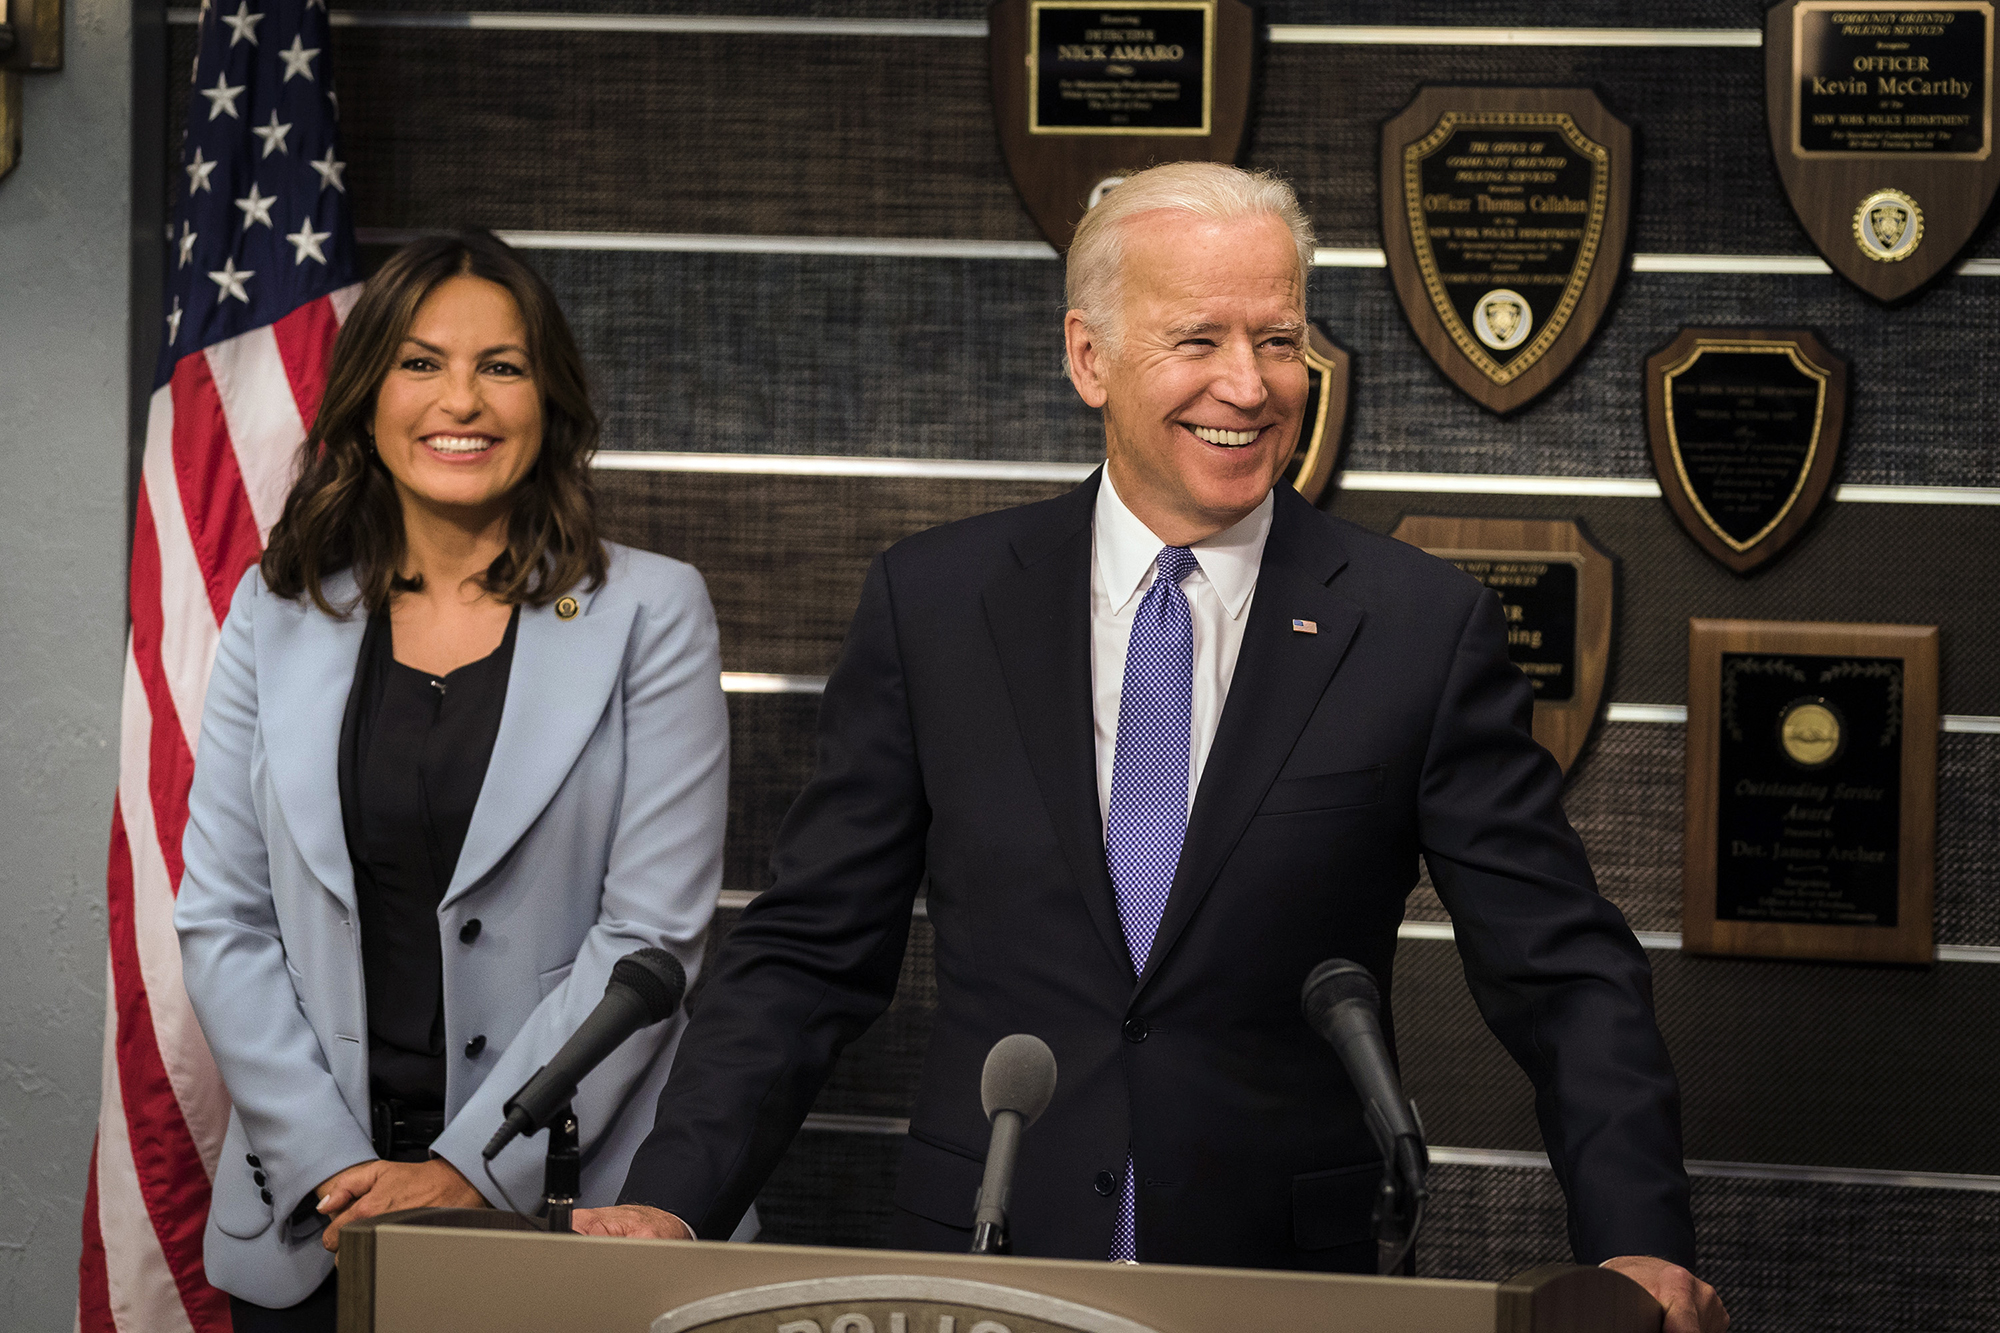 Mariska Hargitay and Vice President Joe Biden on Law & Order: SVU, 2016.